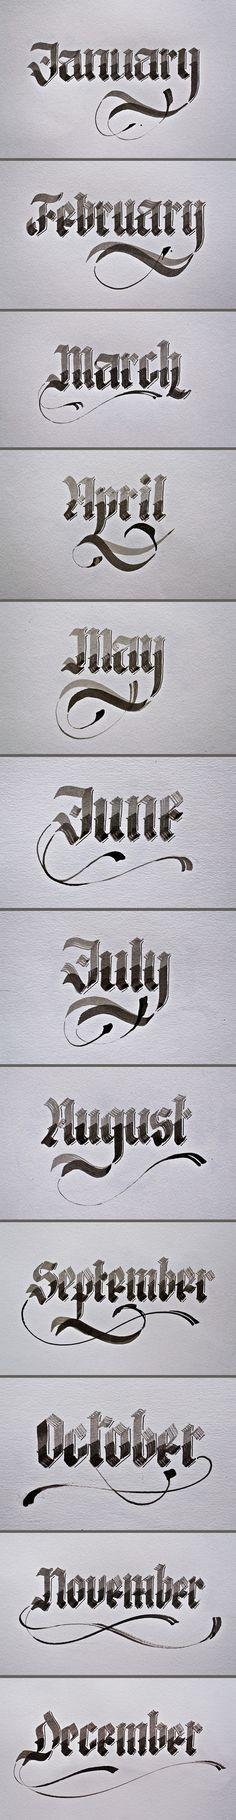 calligraphy 2012